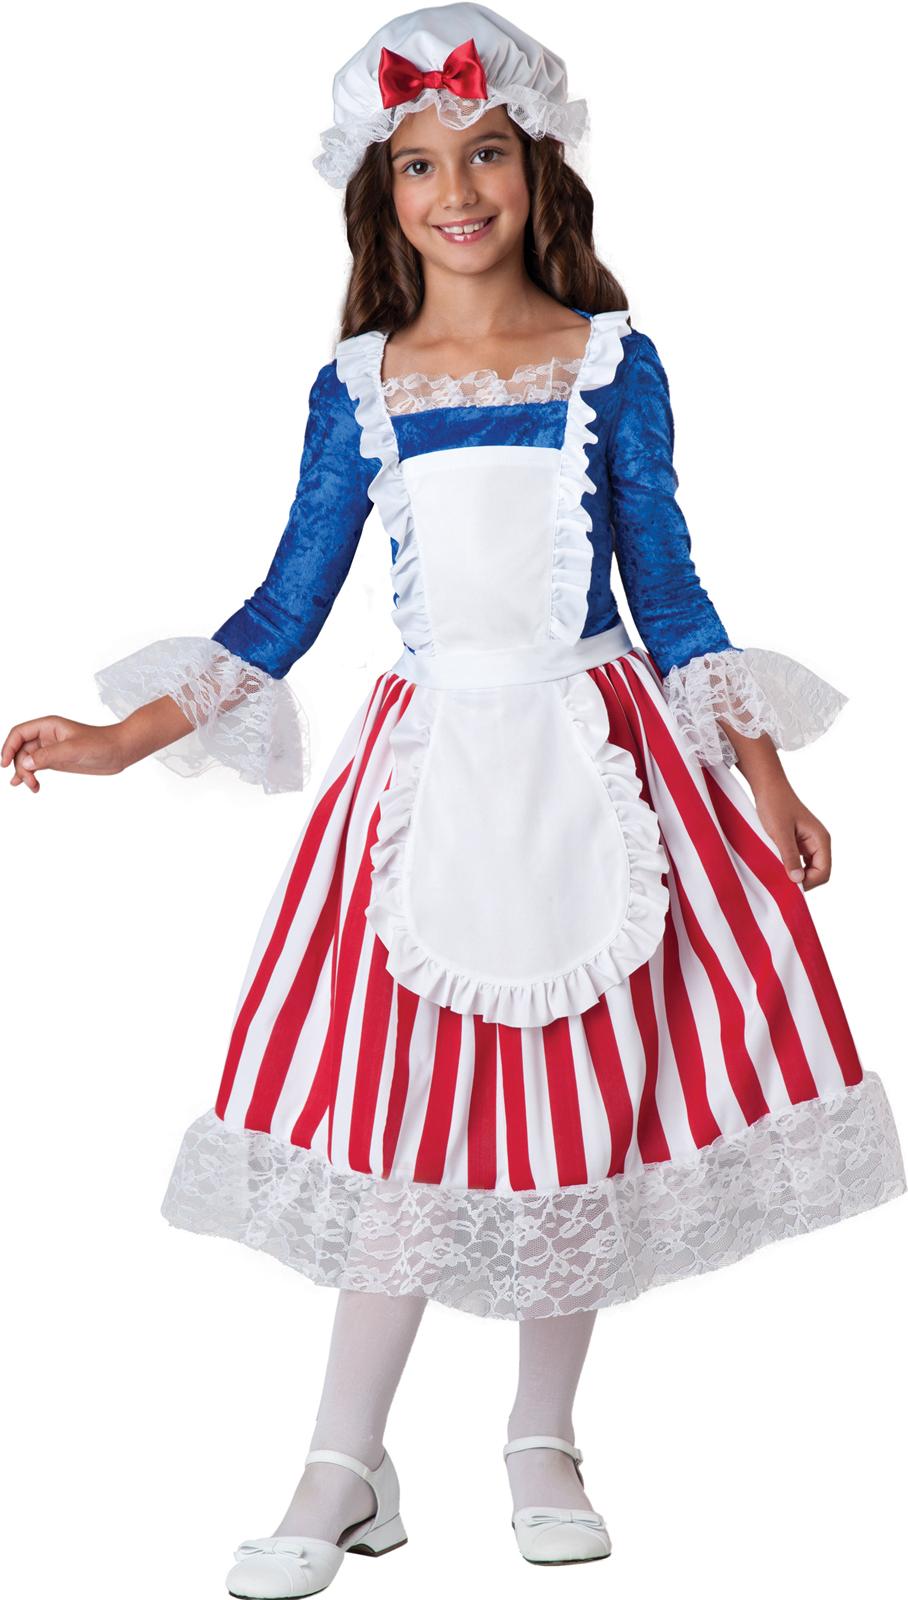 betsy ross child costume large image